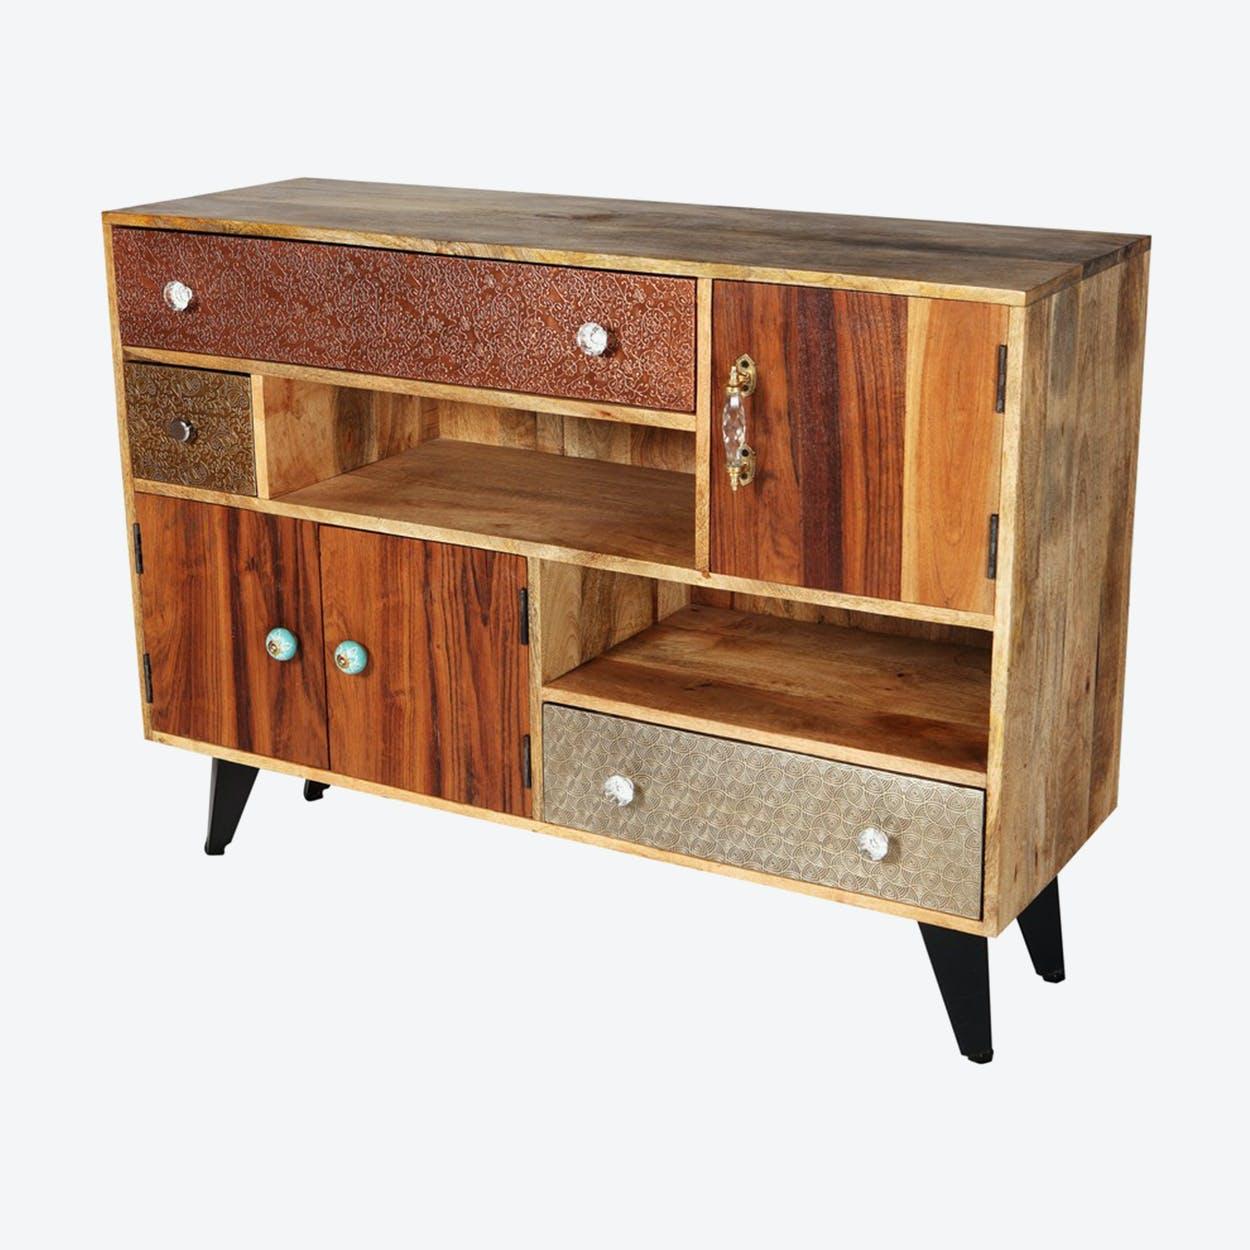 Reclaimed Wood Large Sideboard 1